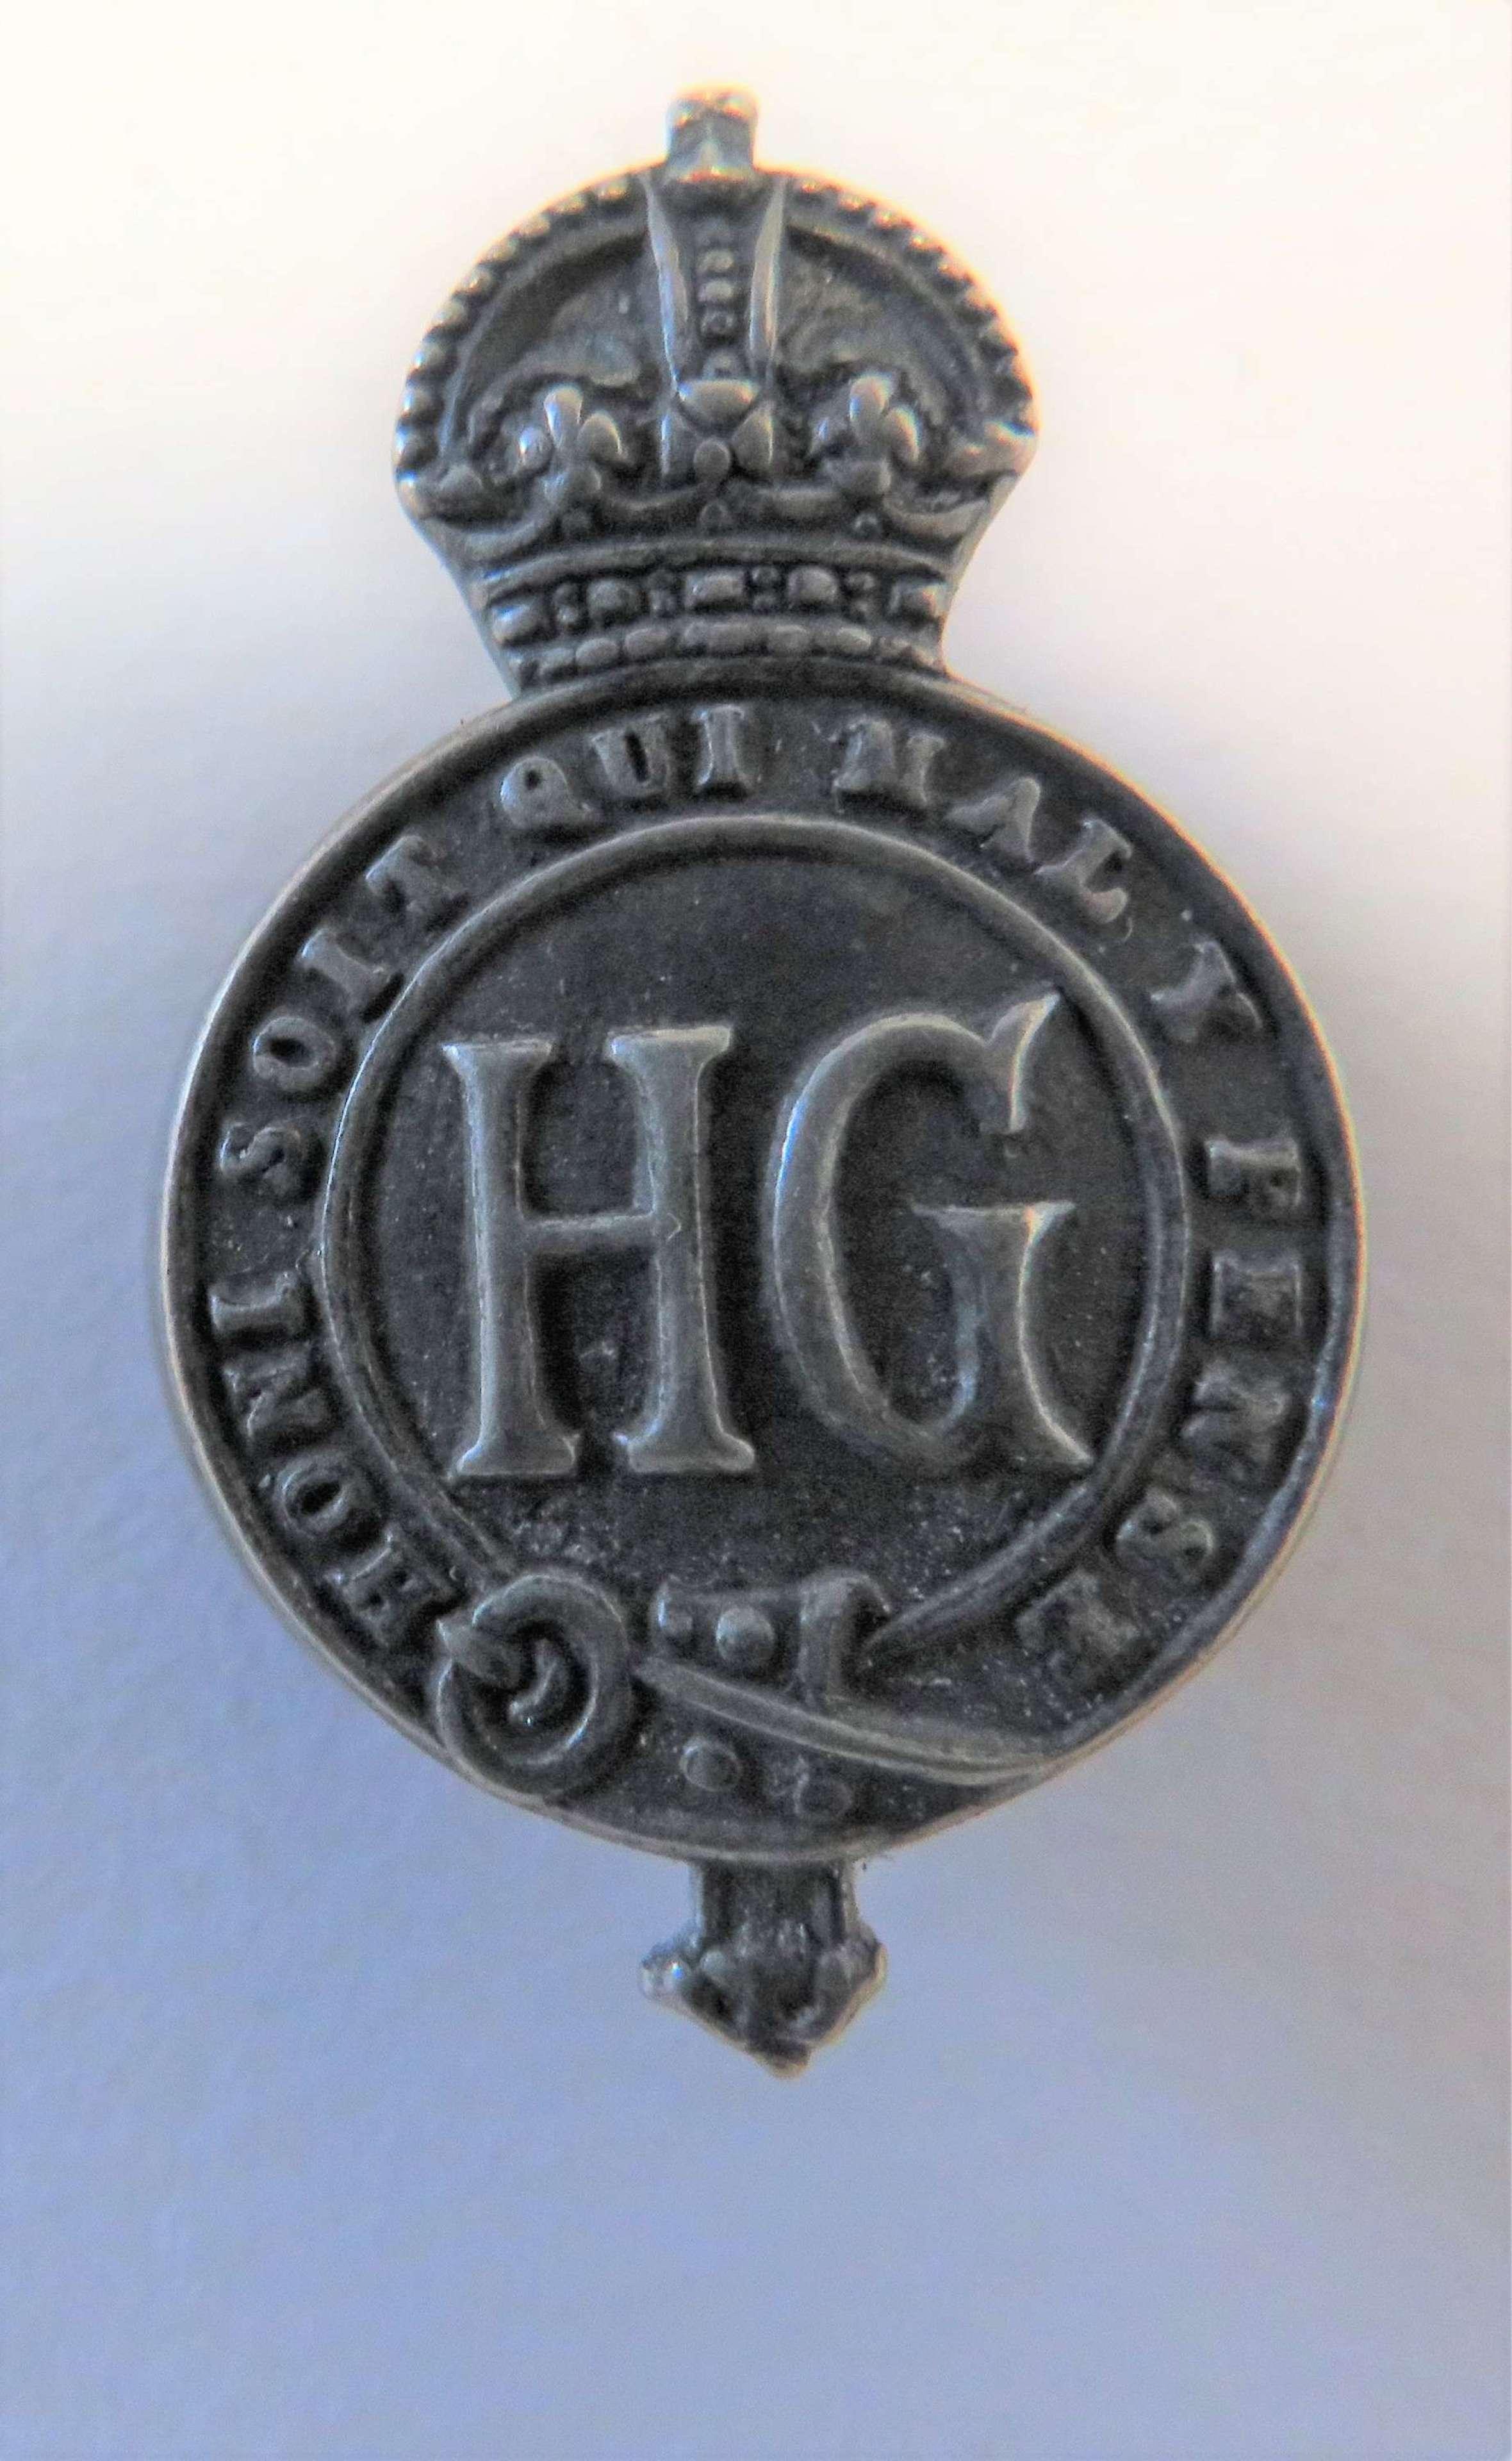 Home Guard Small Size Lapel Badge